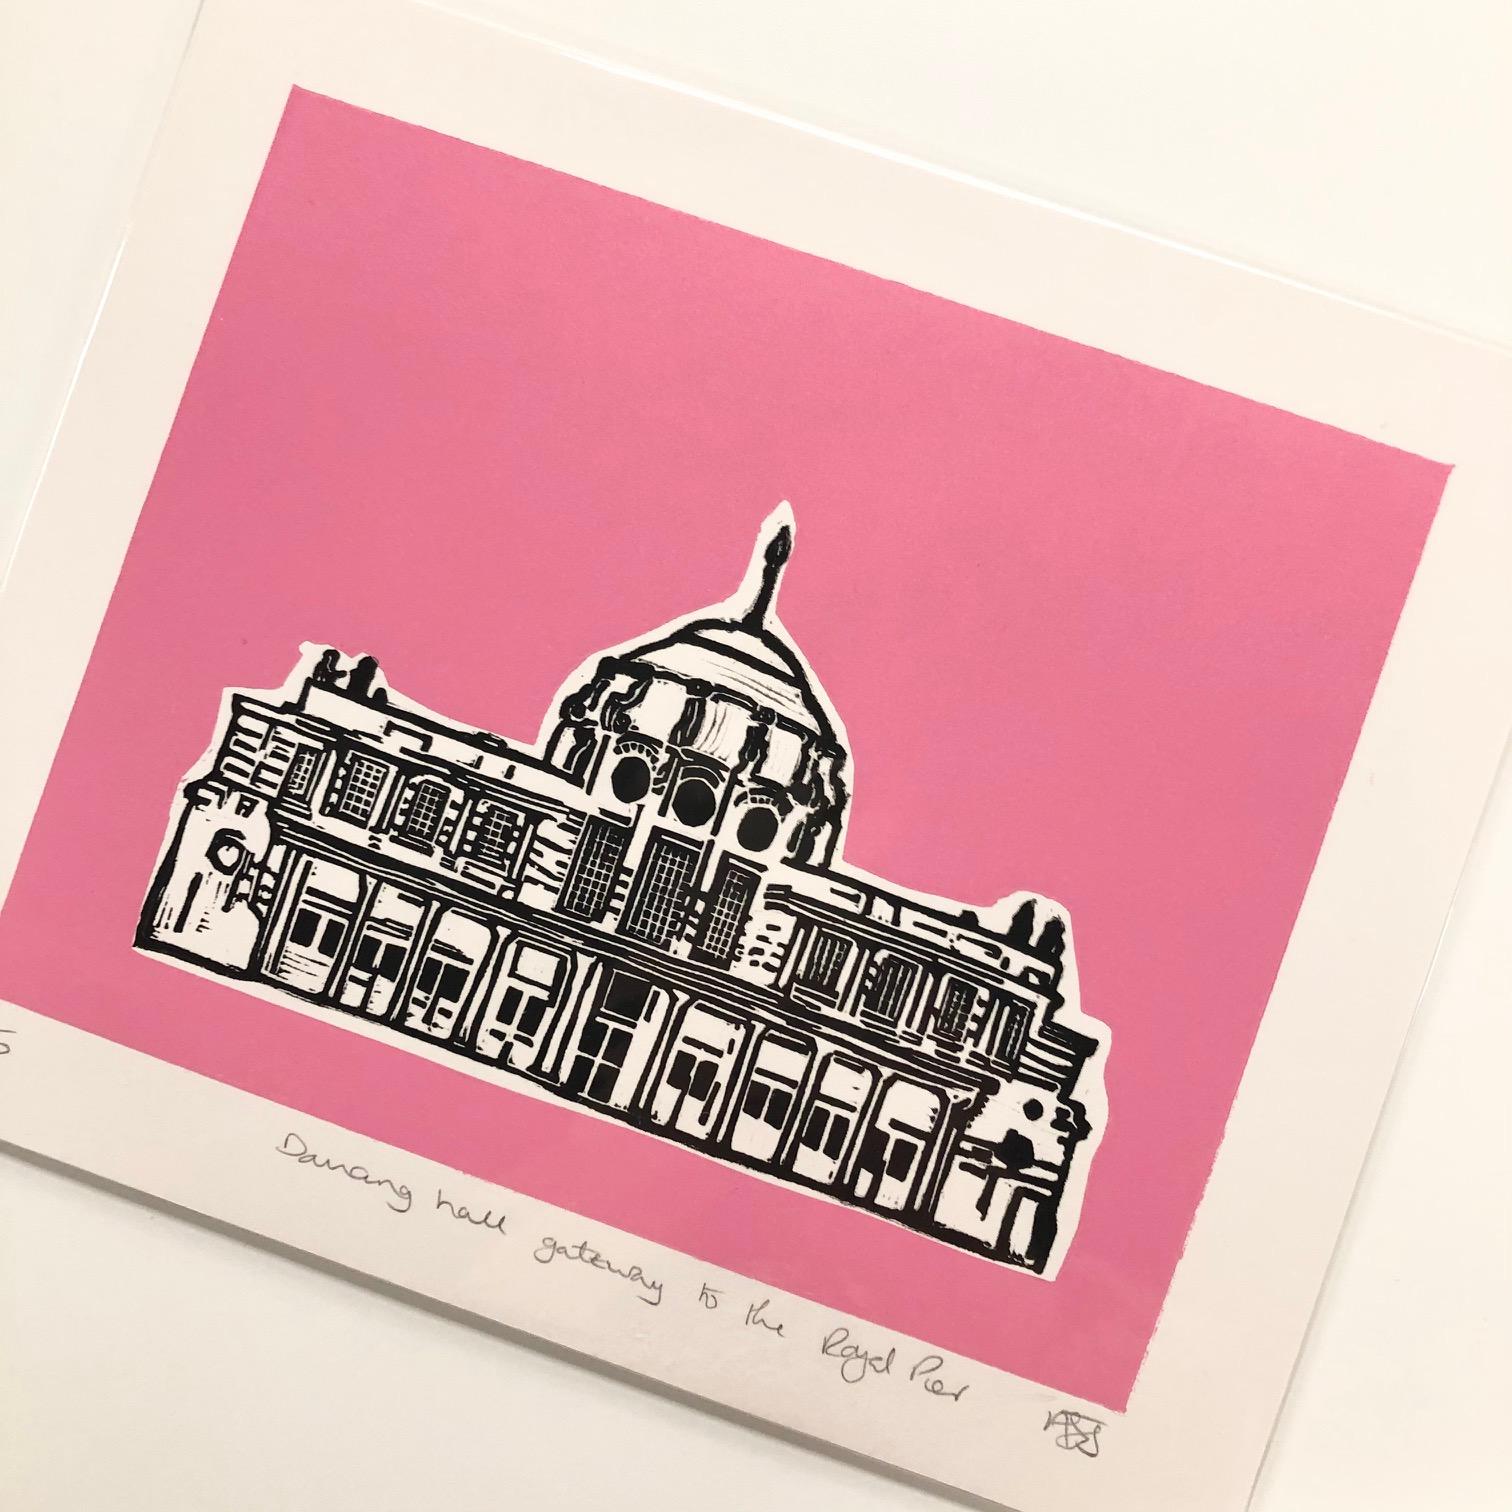 Royal Pier 'Pop' Print by Mandy Smith